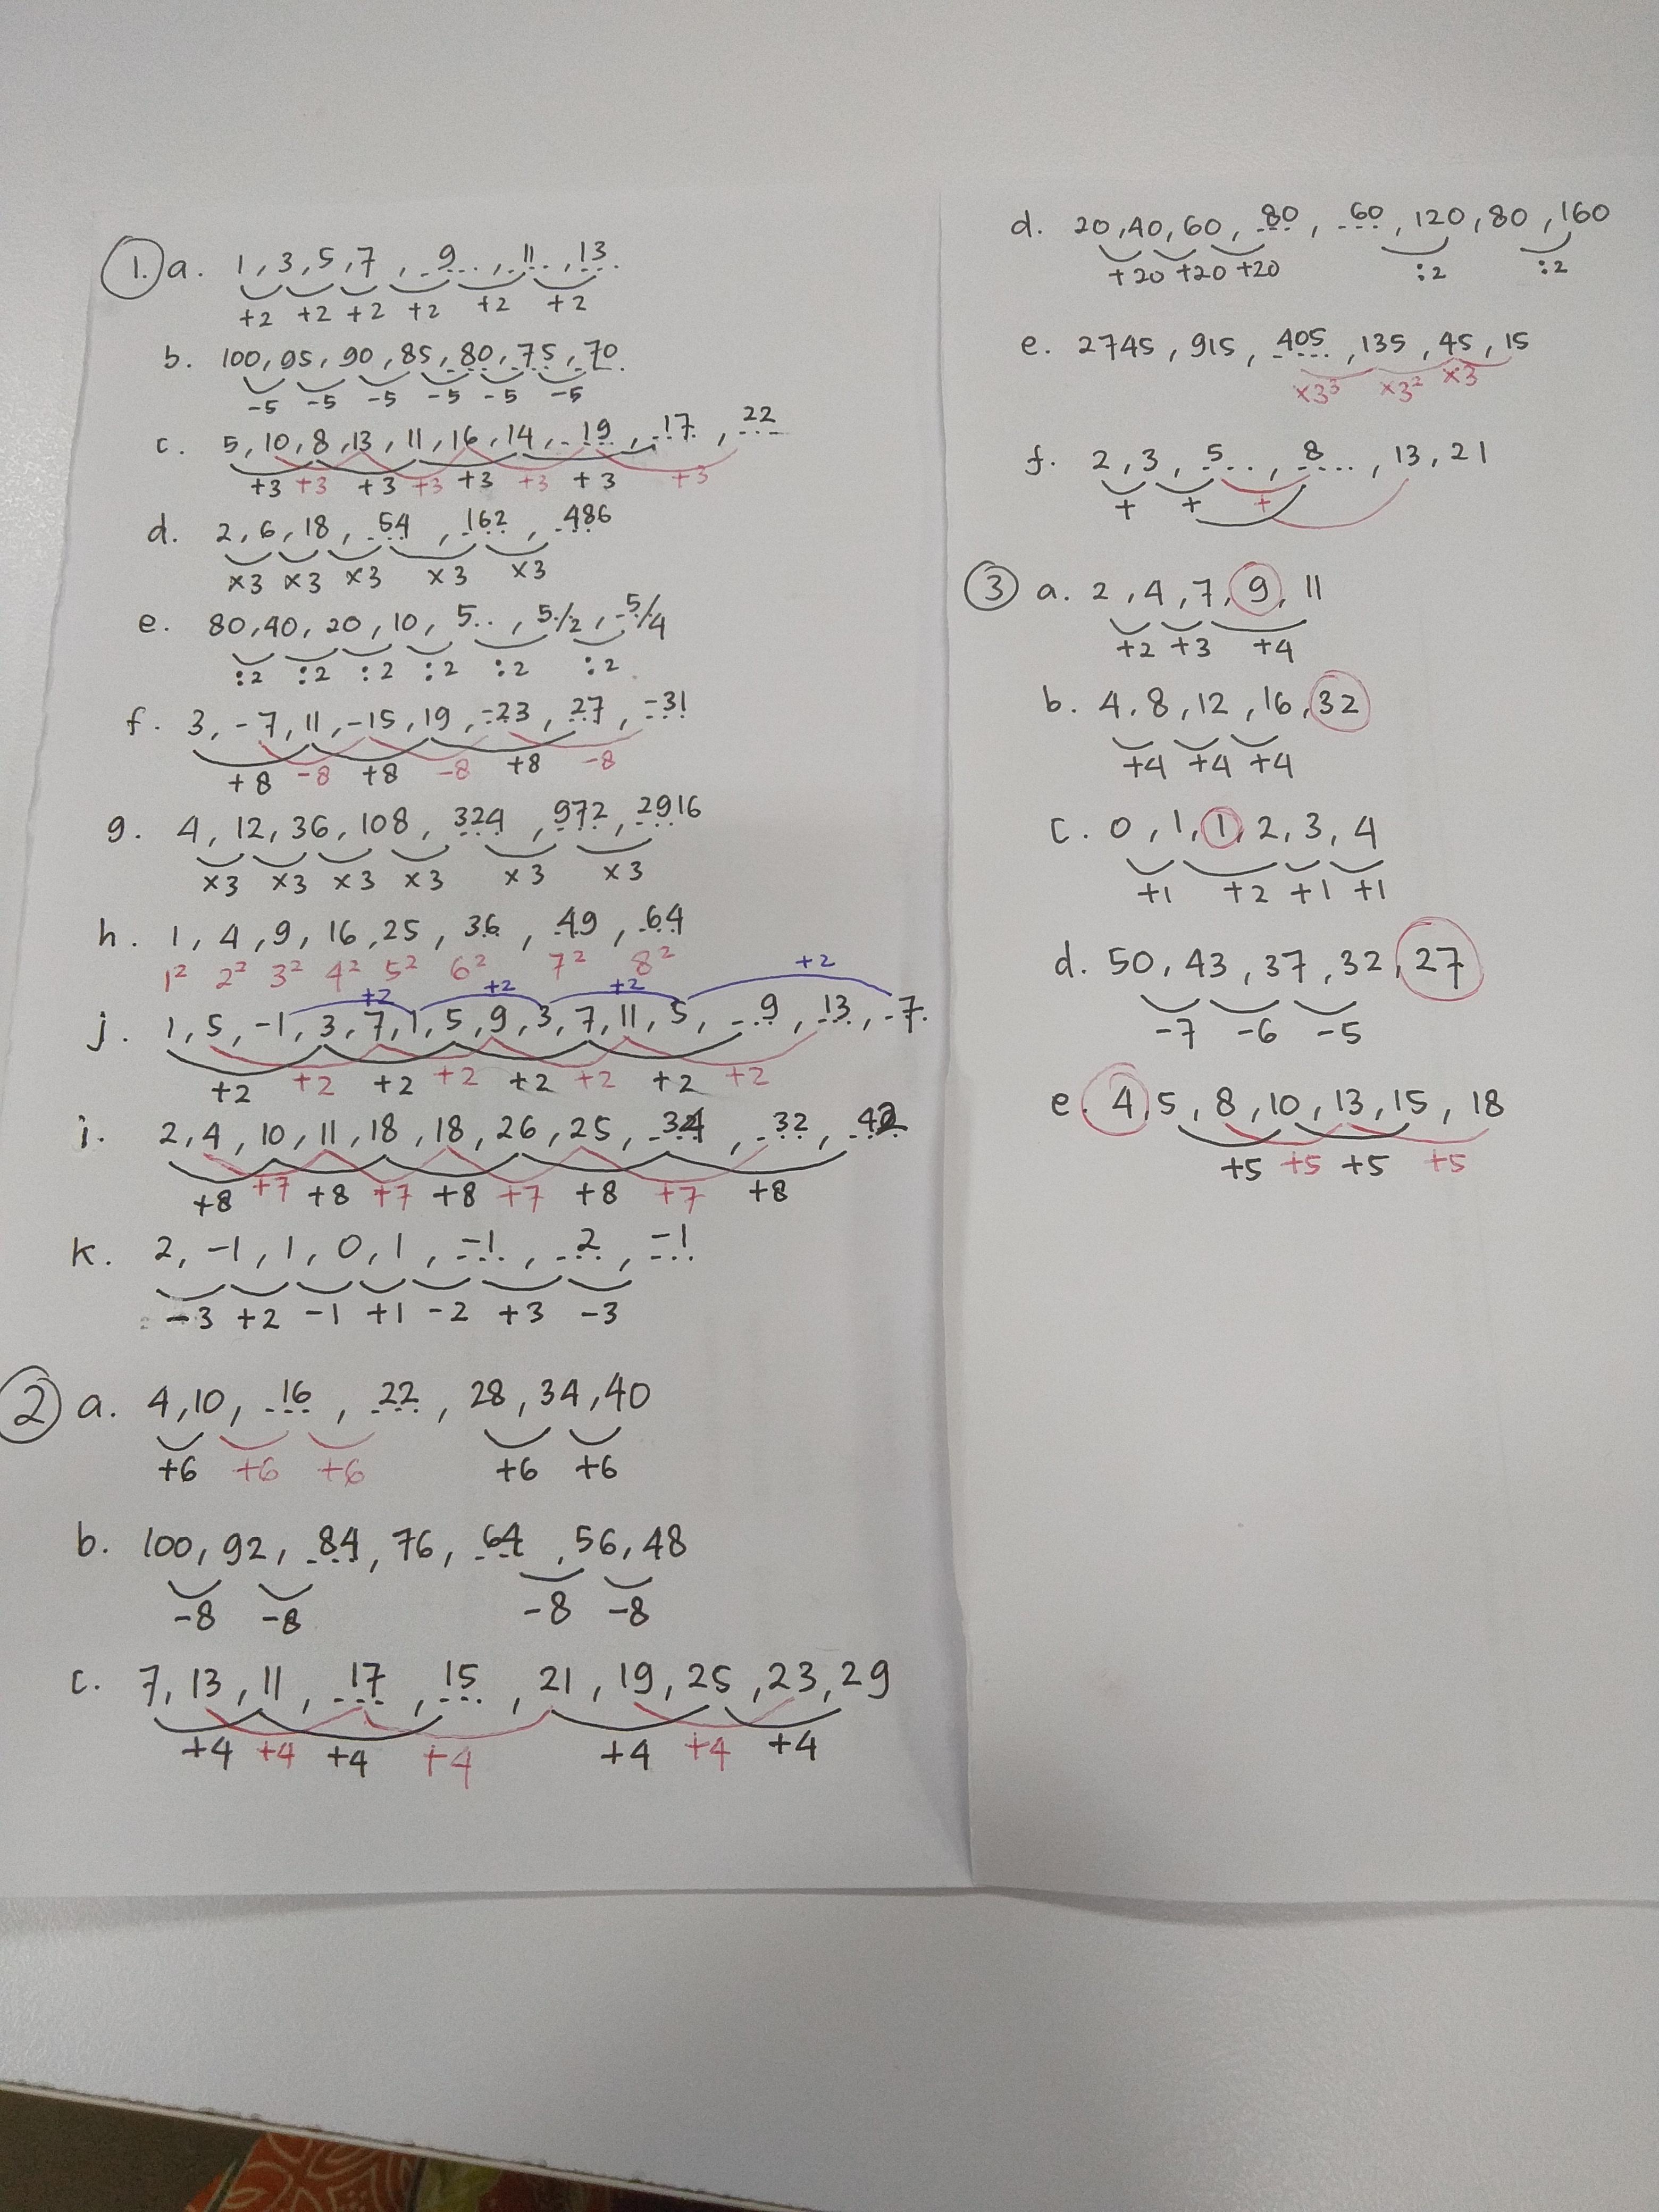 Kunci Jawaban Kirtya Basa Halaman 31 Sampai 33 Soal Bhs Jawa Kelas 7 Kurikulum 2013 Brainly Co Id Anonim Tanpa Nama D Blog Tentang Bunga